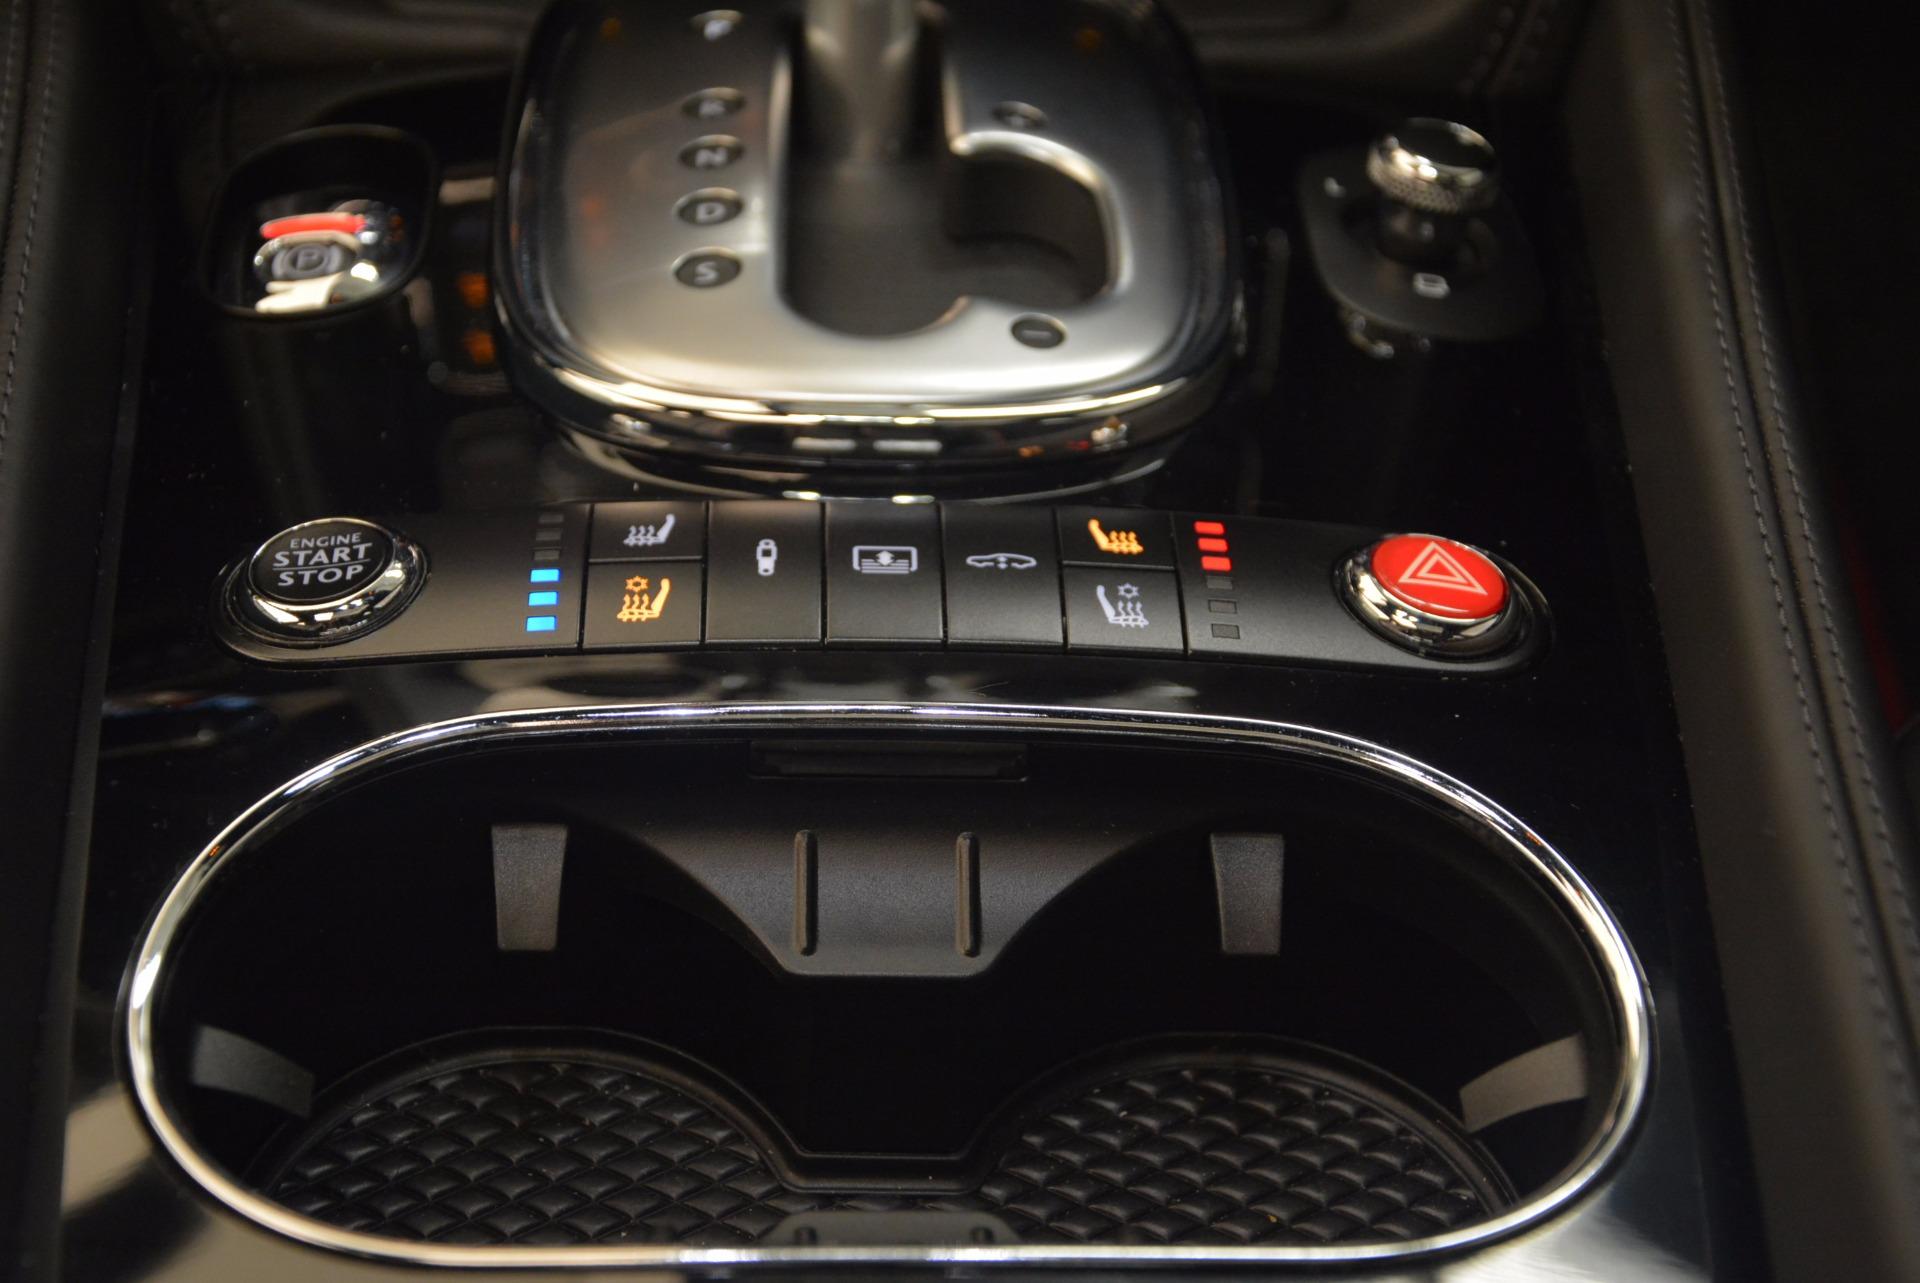 Used 2015 Bentley Flying Spur V8 For Sale In Westport, CT 1199_p29